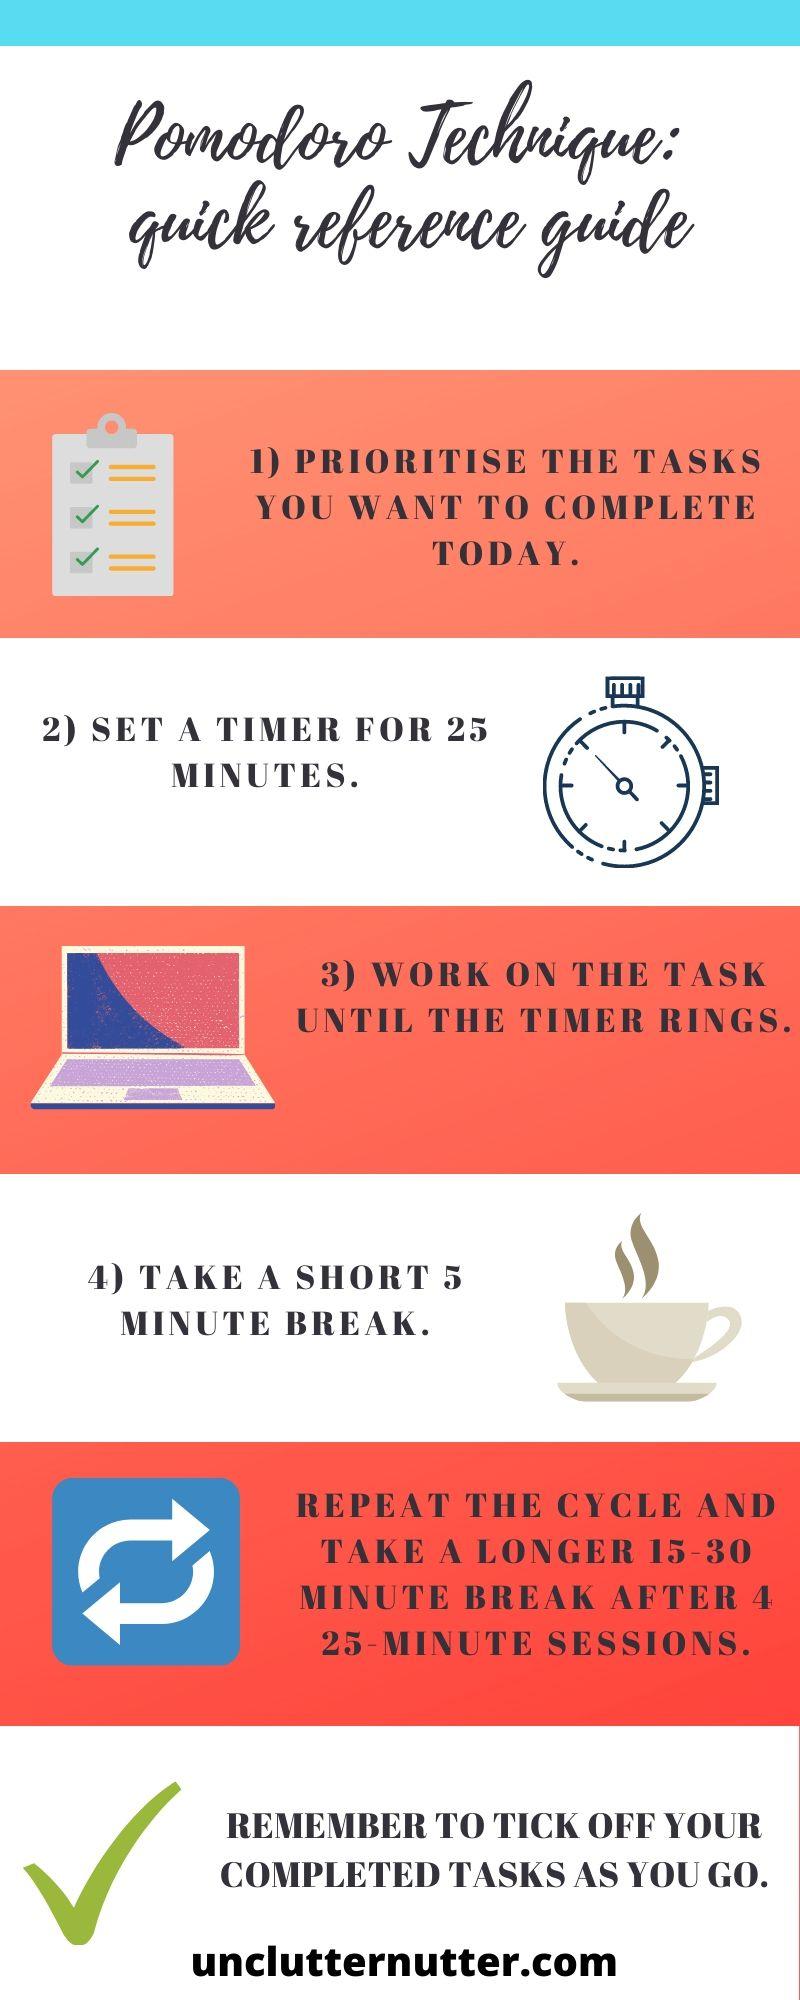 Pomodoro technique infographic